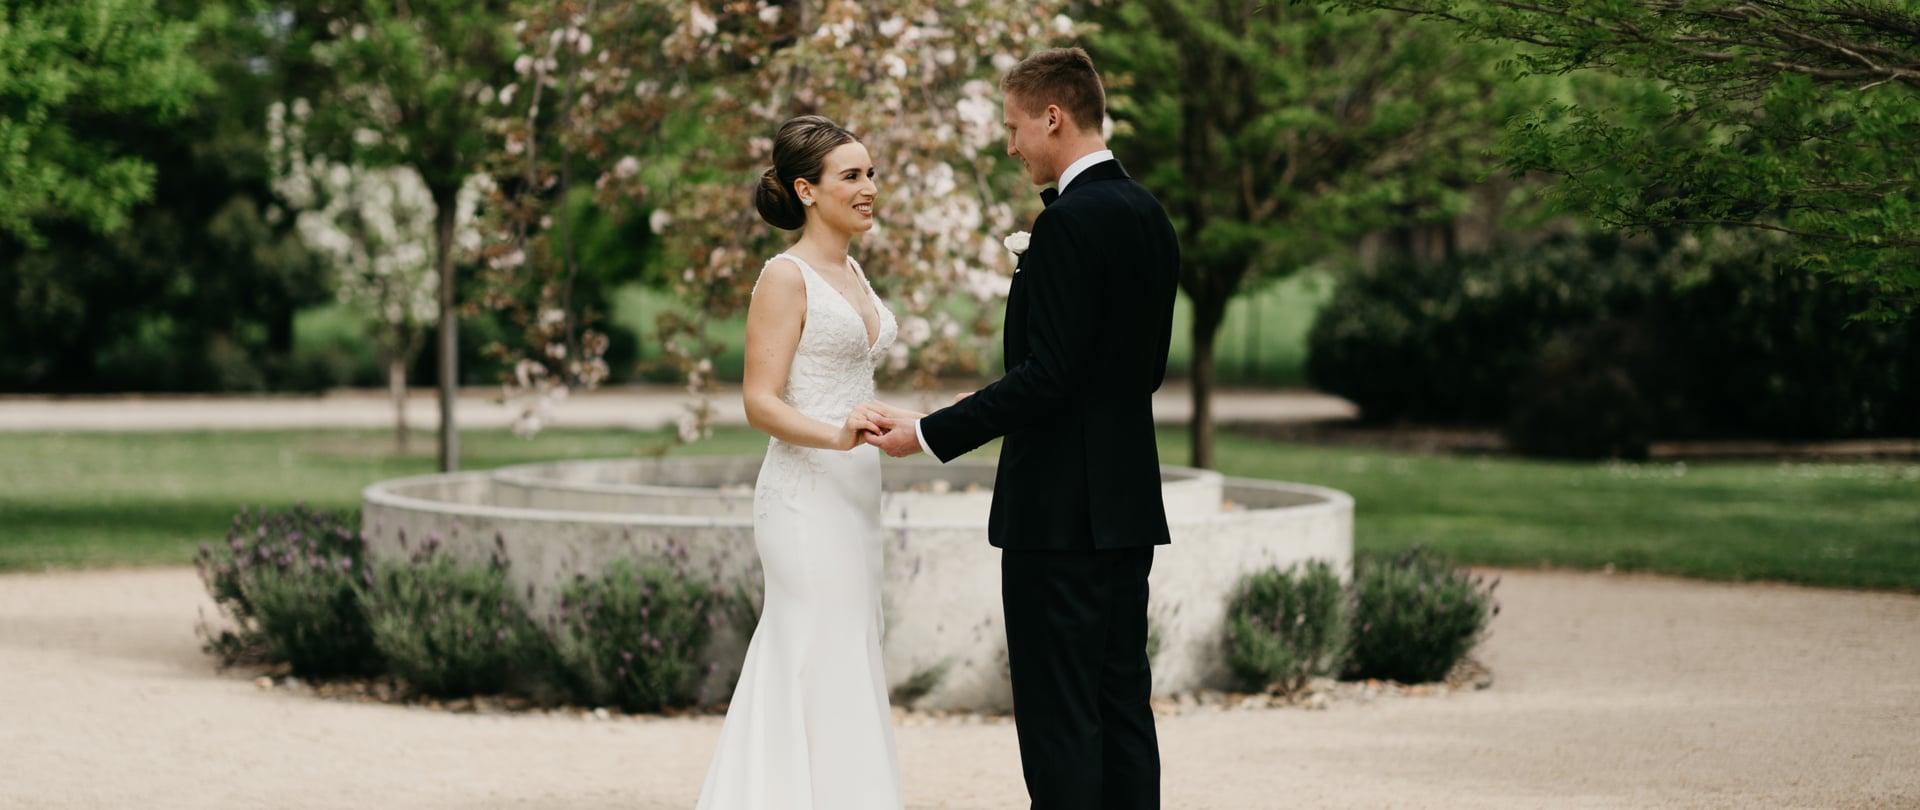 Kristina & Tim Wedding Video Filmed at Yarra Valley, Victoria